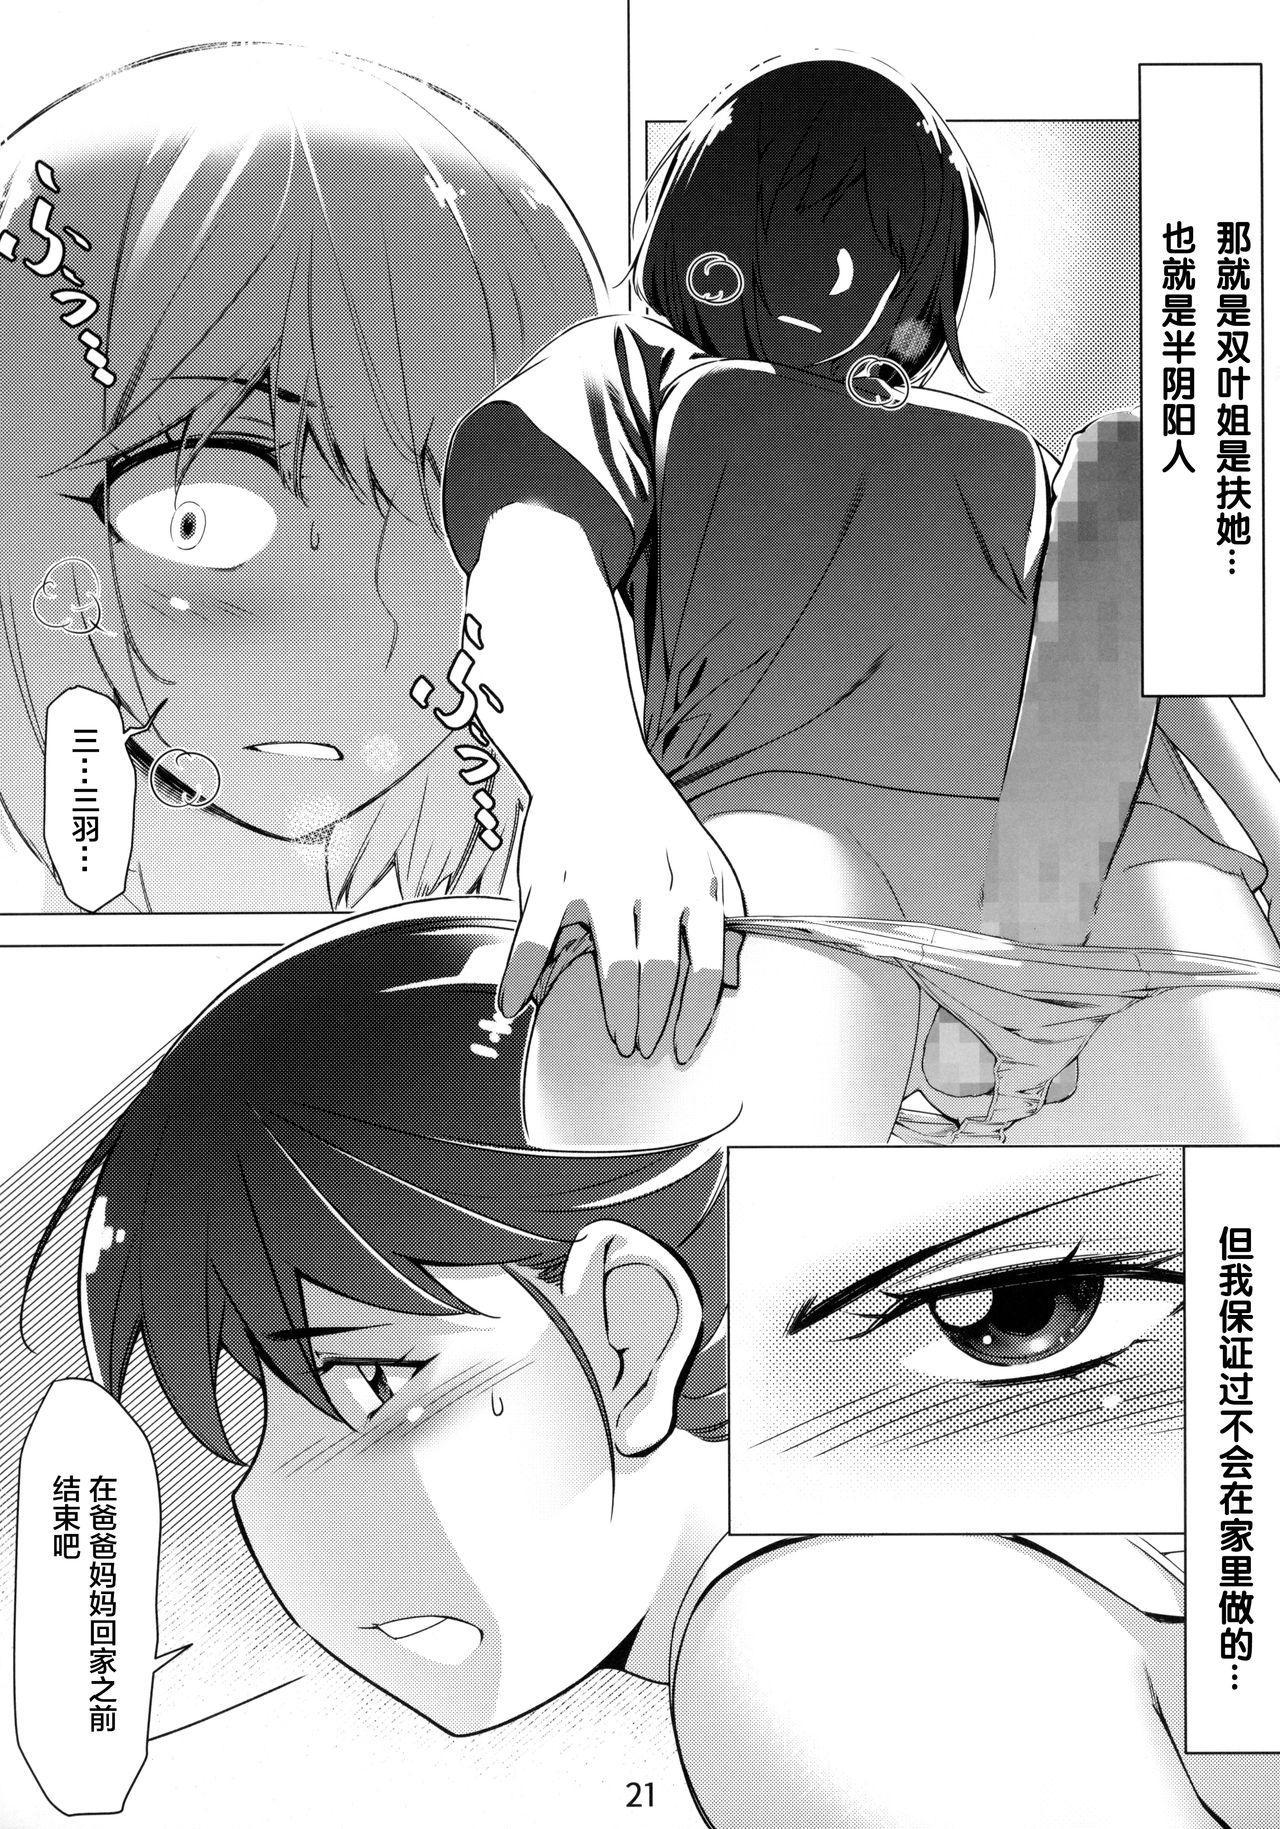 Otonano Omochiya 6 Kan 20